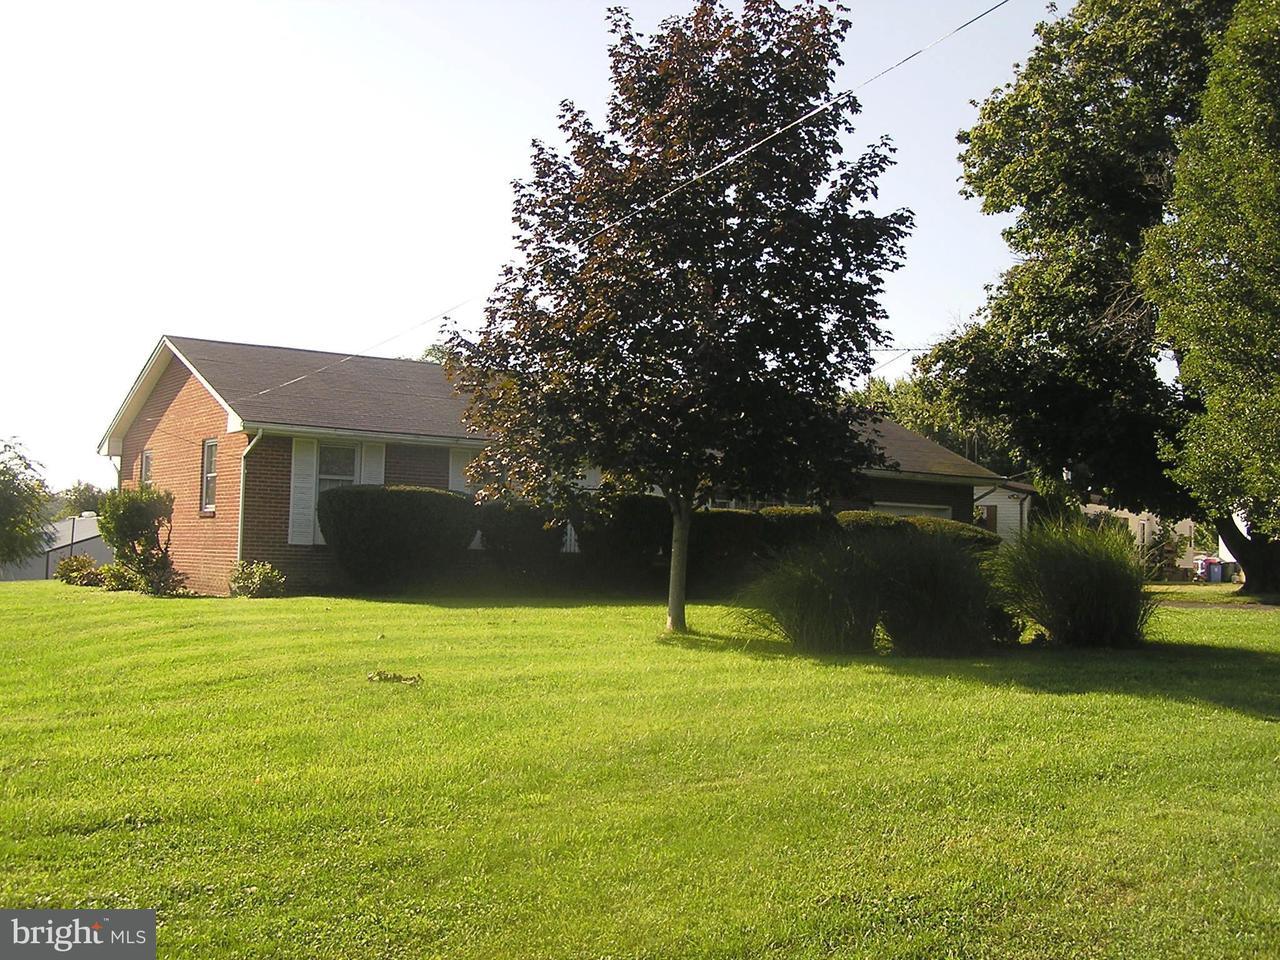 Additional photo for property listing at 2674 MARTINSBURG PIKE 2674 MARTINSBURG PIKE Stephenson, Virginia 22656 Estados Unidos